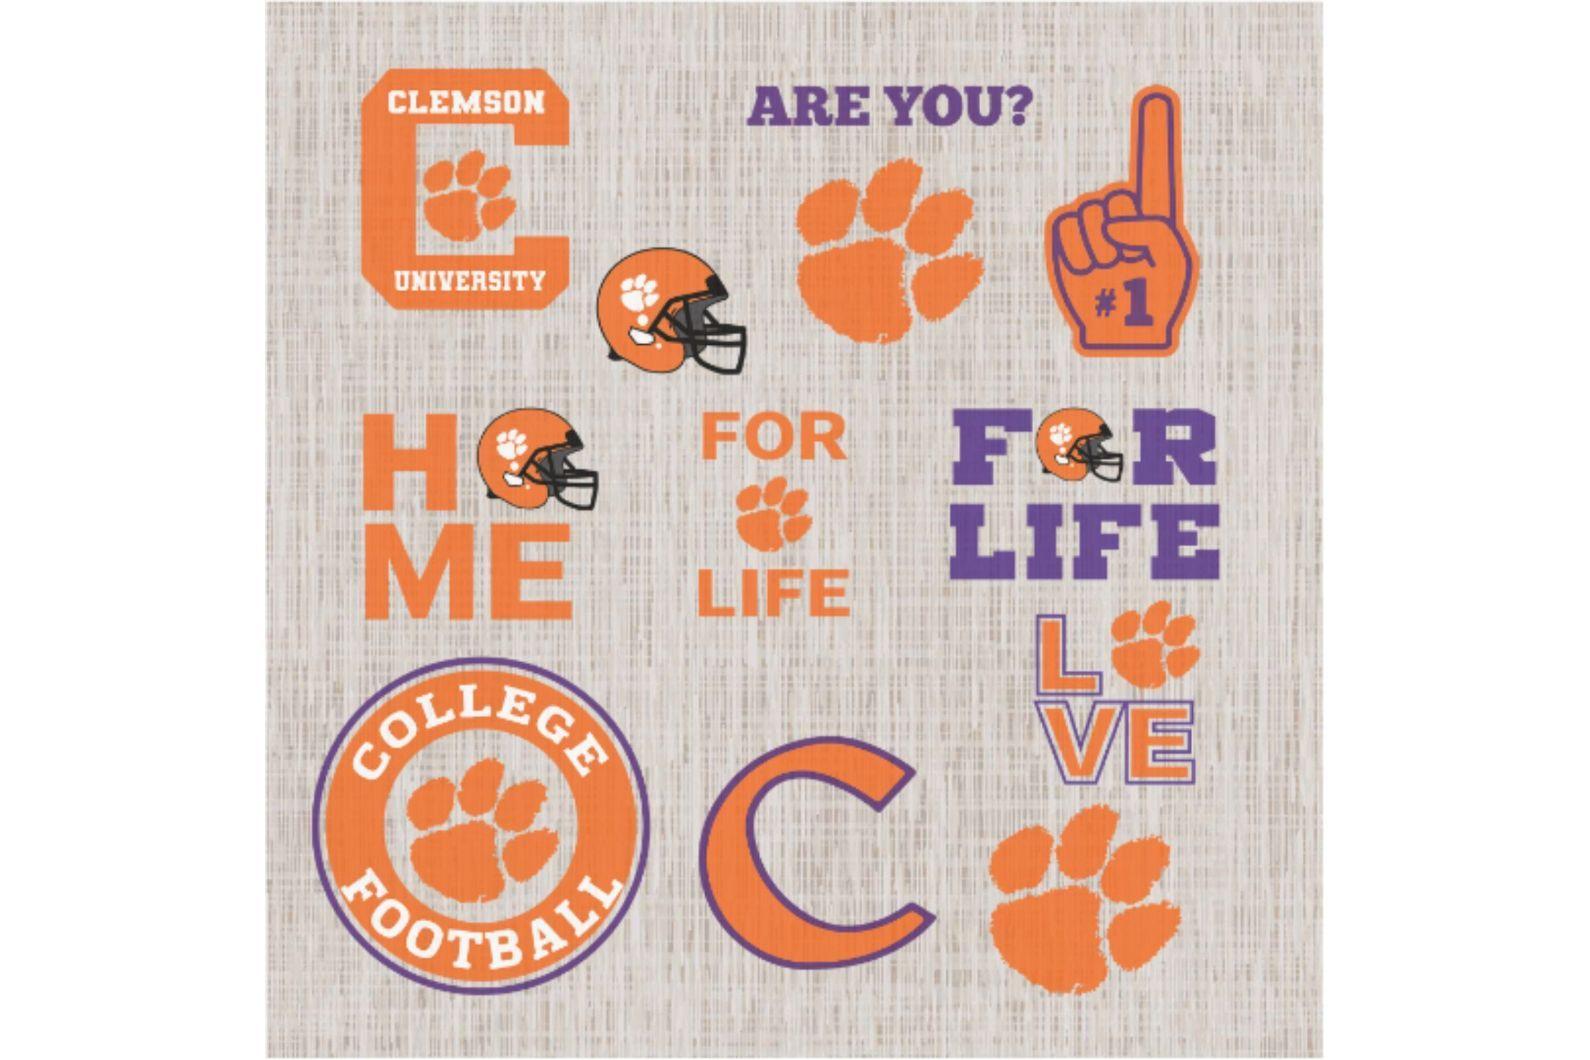 Clemson Tiger Svg Football Svg Football Gift Clemson University Clemson Football Clemson Tiger Fo In 2020 Svg Football Gifts Football Team Logos